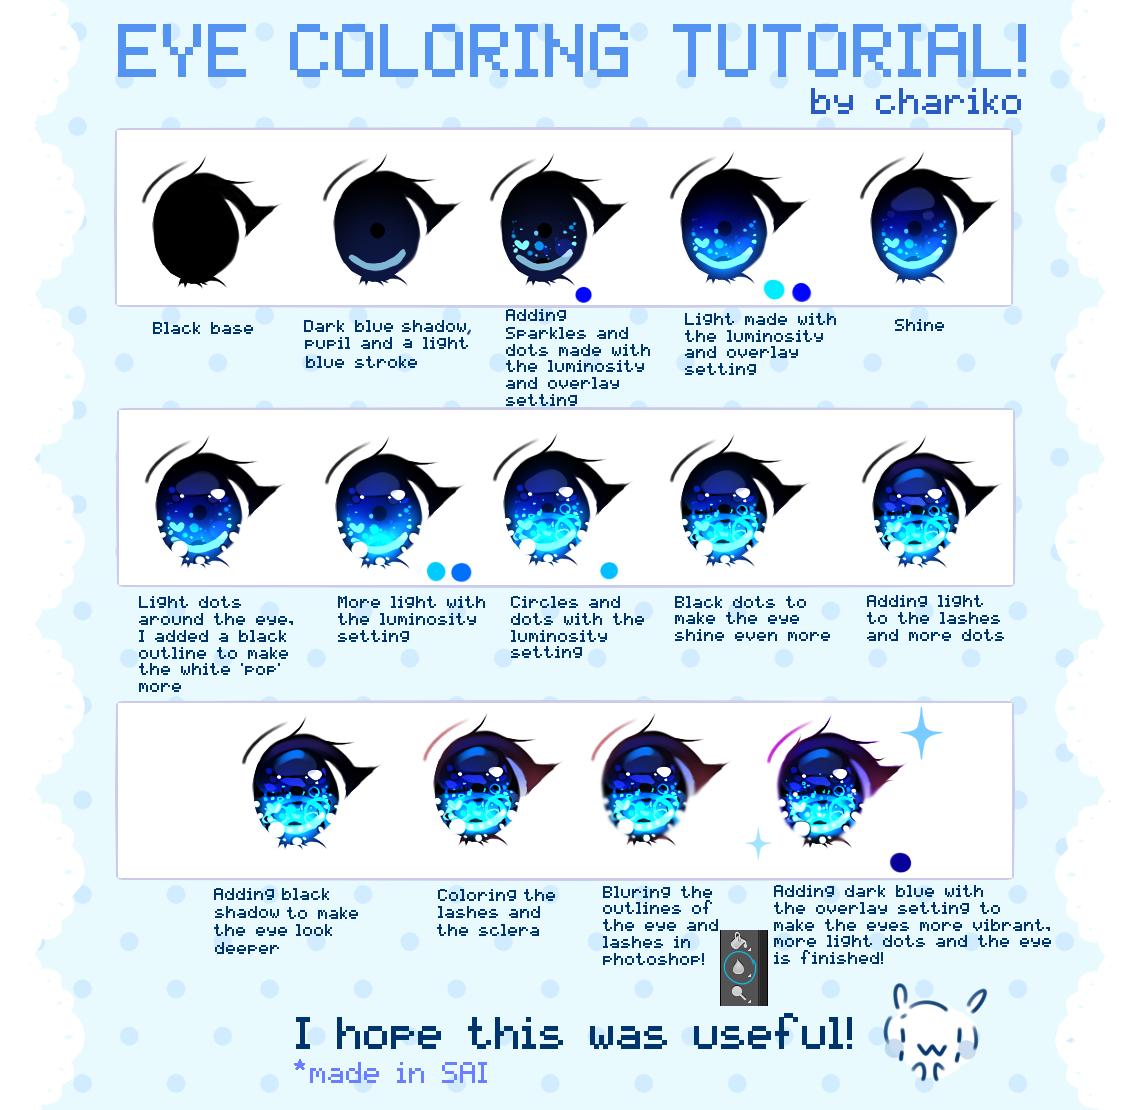 Pin By Msr Naruto On Tutorials Coloring Tutorial Anime Eye Drawing Eye Drawing Tutorials